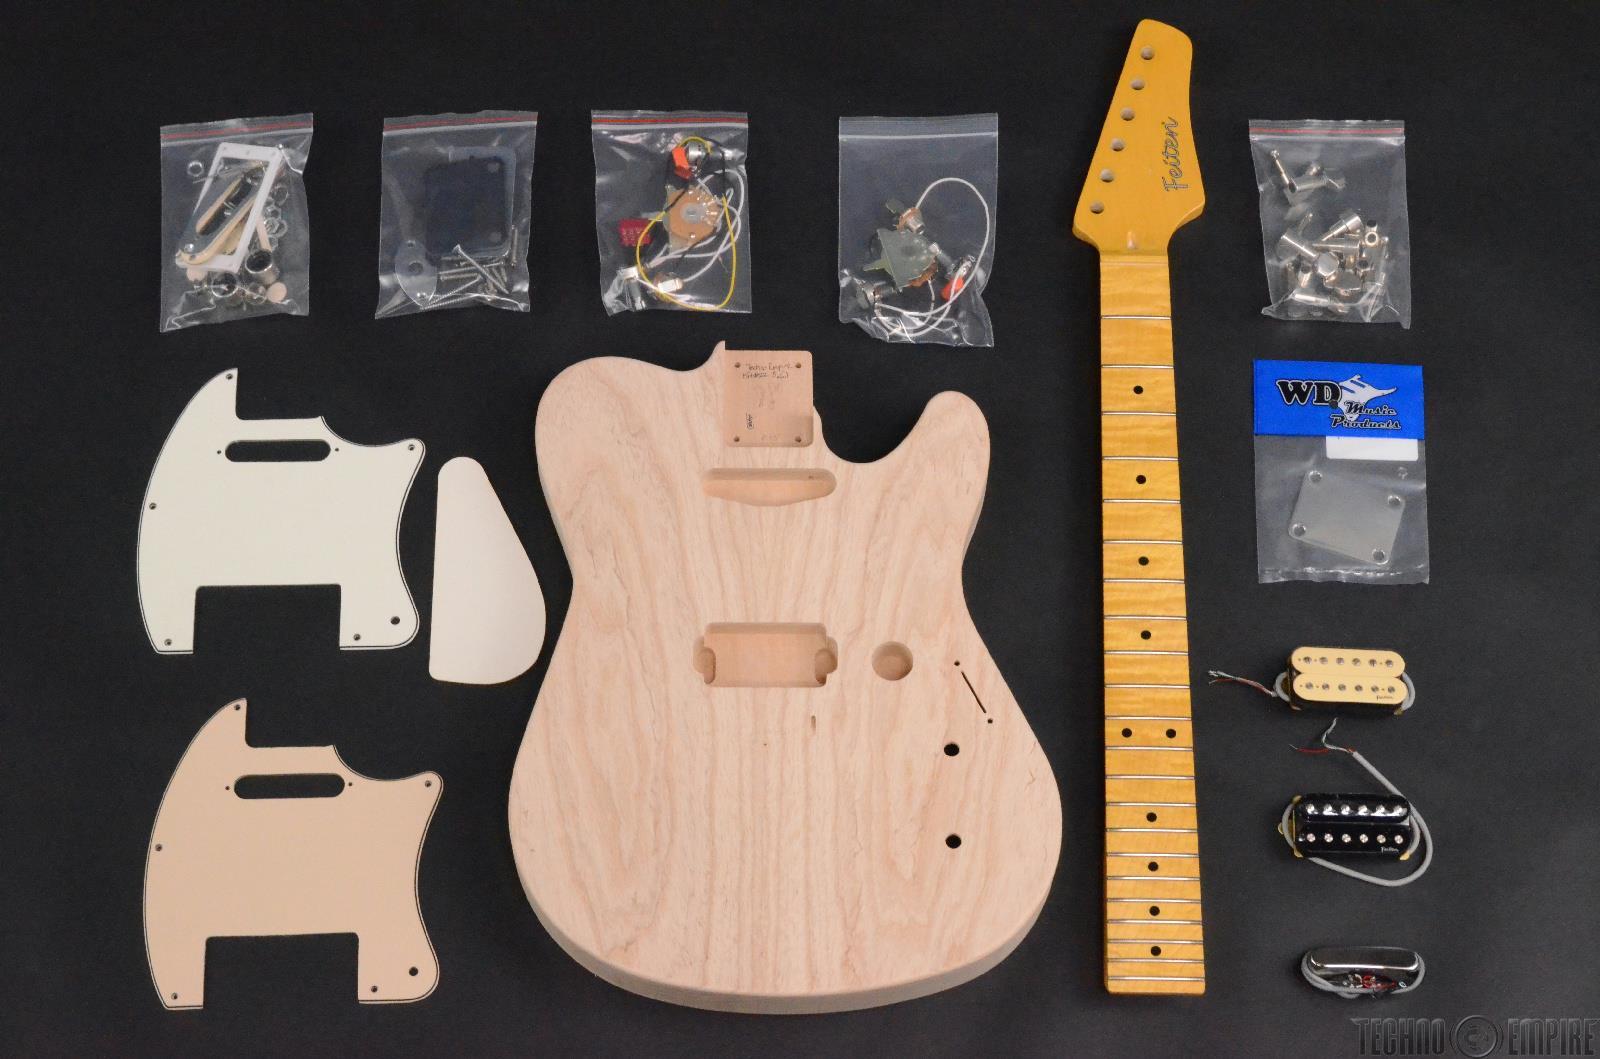 buzz feiten elite pro build your own electric guitar kit 28459 ebay. Black Bedroom Furniture Sets. Home Design Ideas